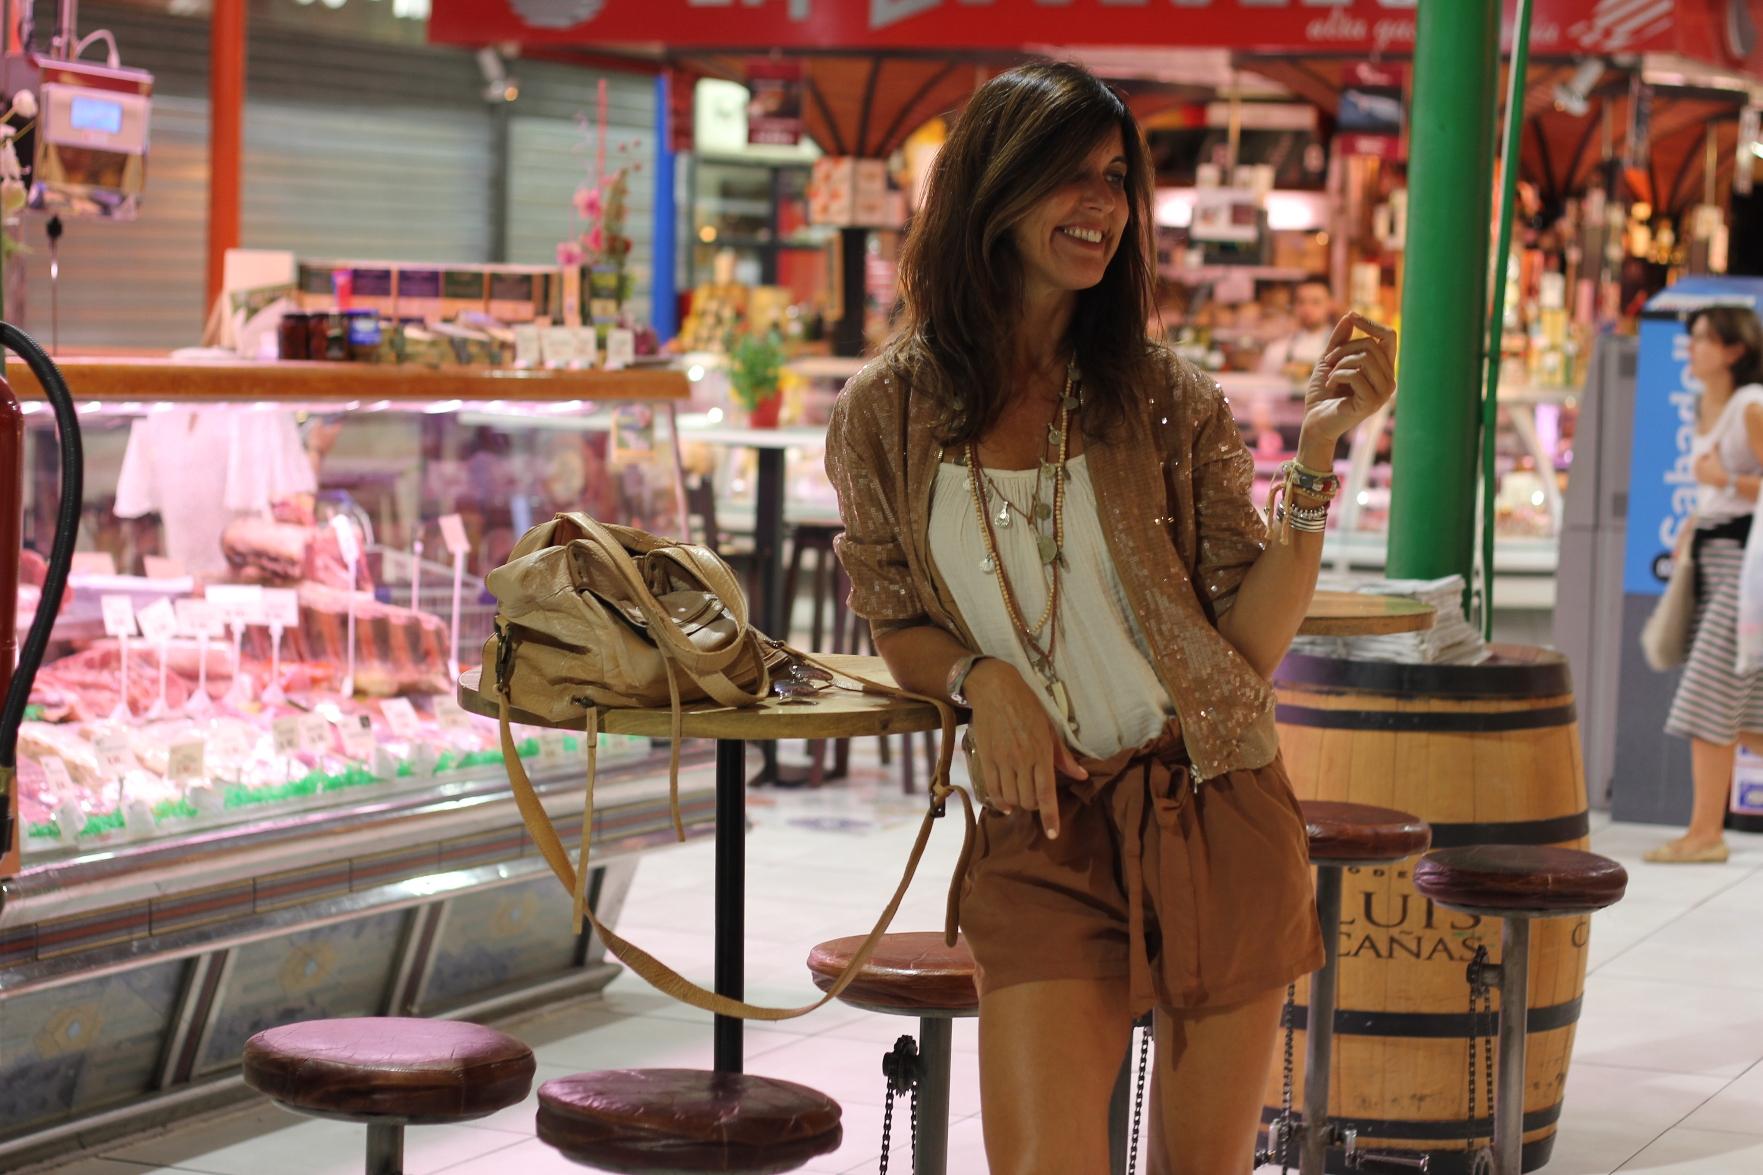 market in the city-65110-mytenida